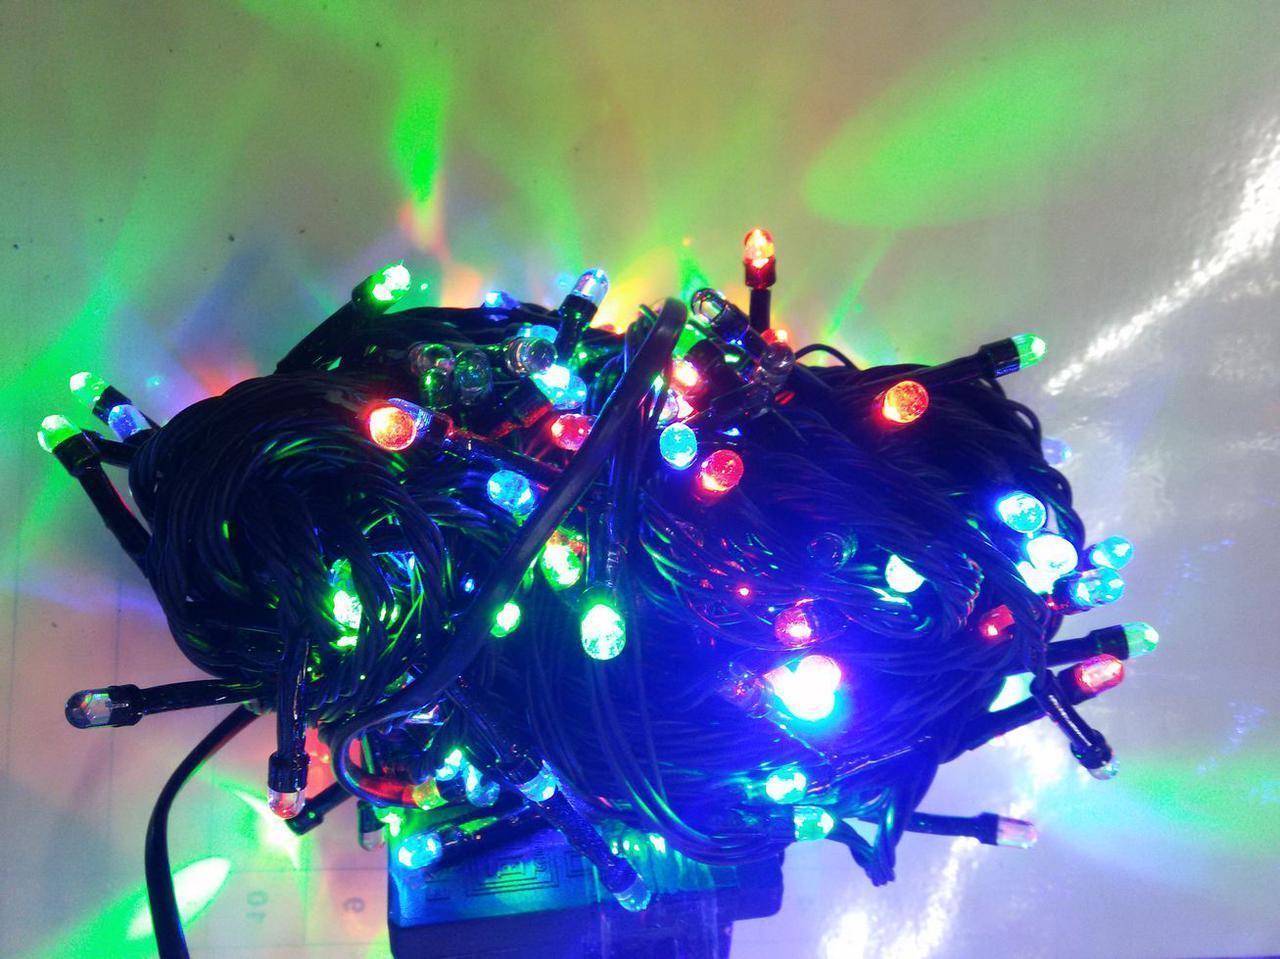 Гирлянда  ЛИЗА  500 LED5mm  на черном проводе, разноцветная